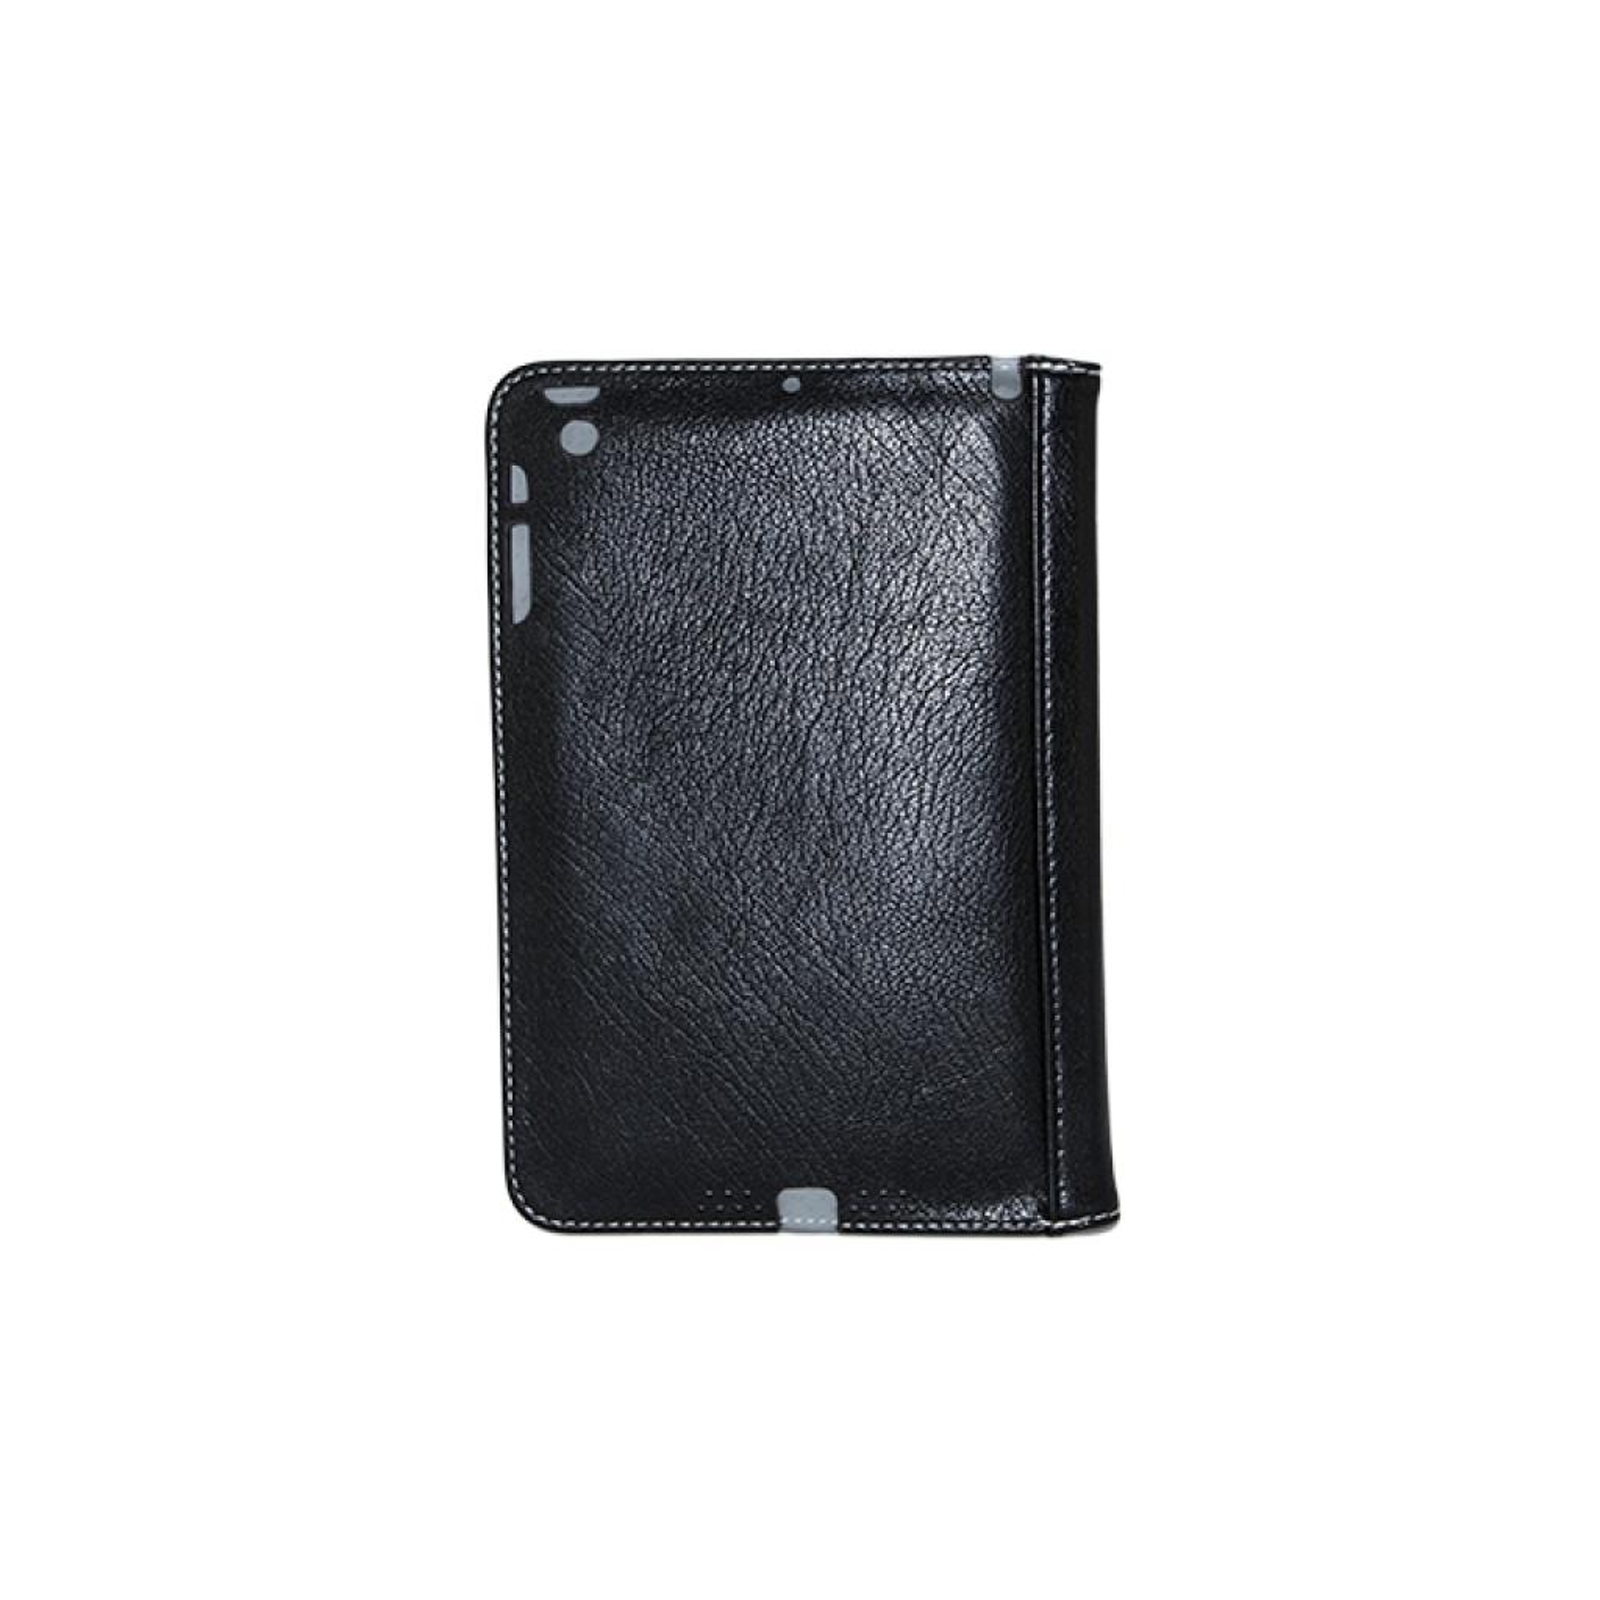 Чехол для планшета Drobak 7.9 Apple iPad mini /Comfort Style/Black (210247) изображение 4